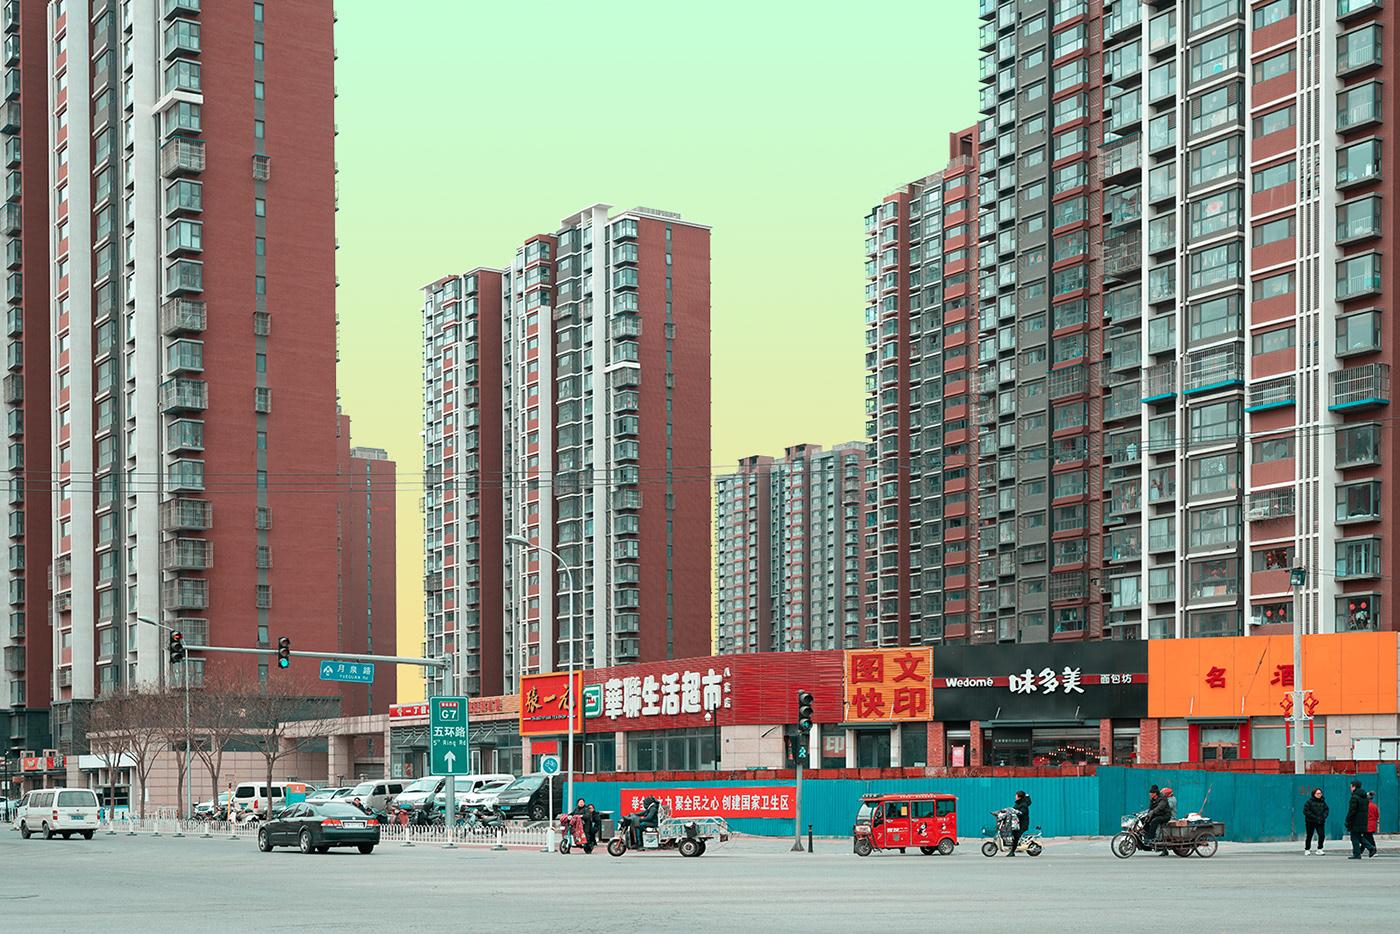 city china people architecture streets acid hi-tech future smog glow